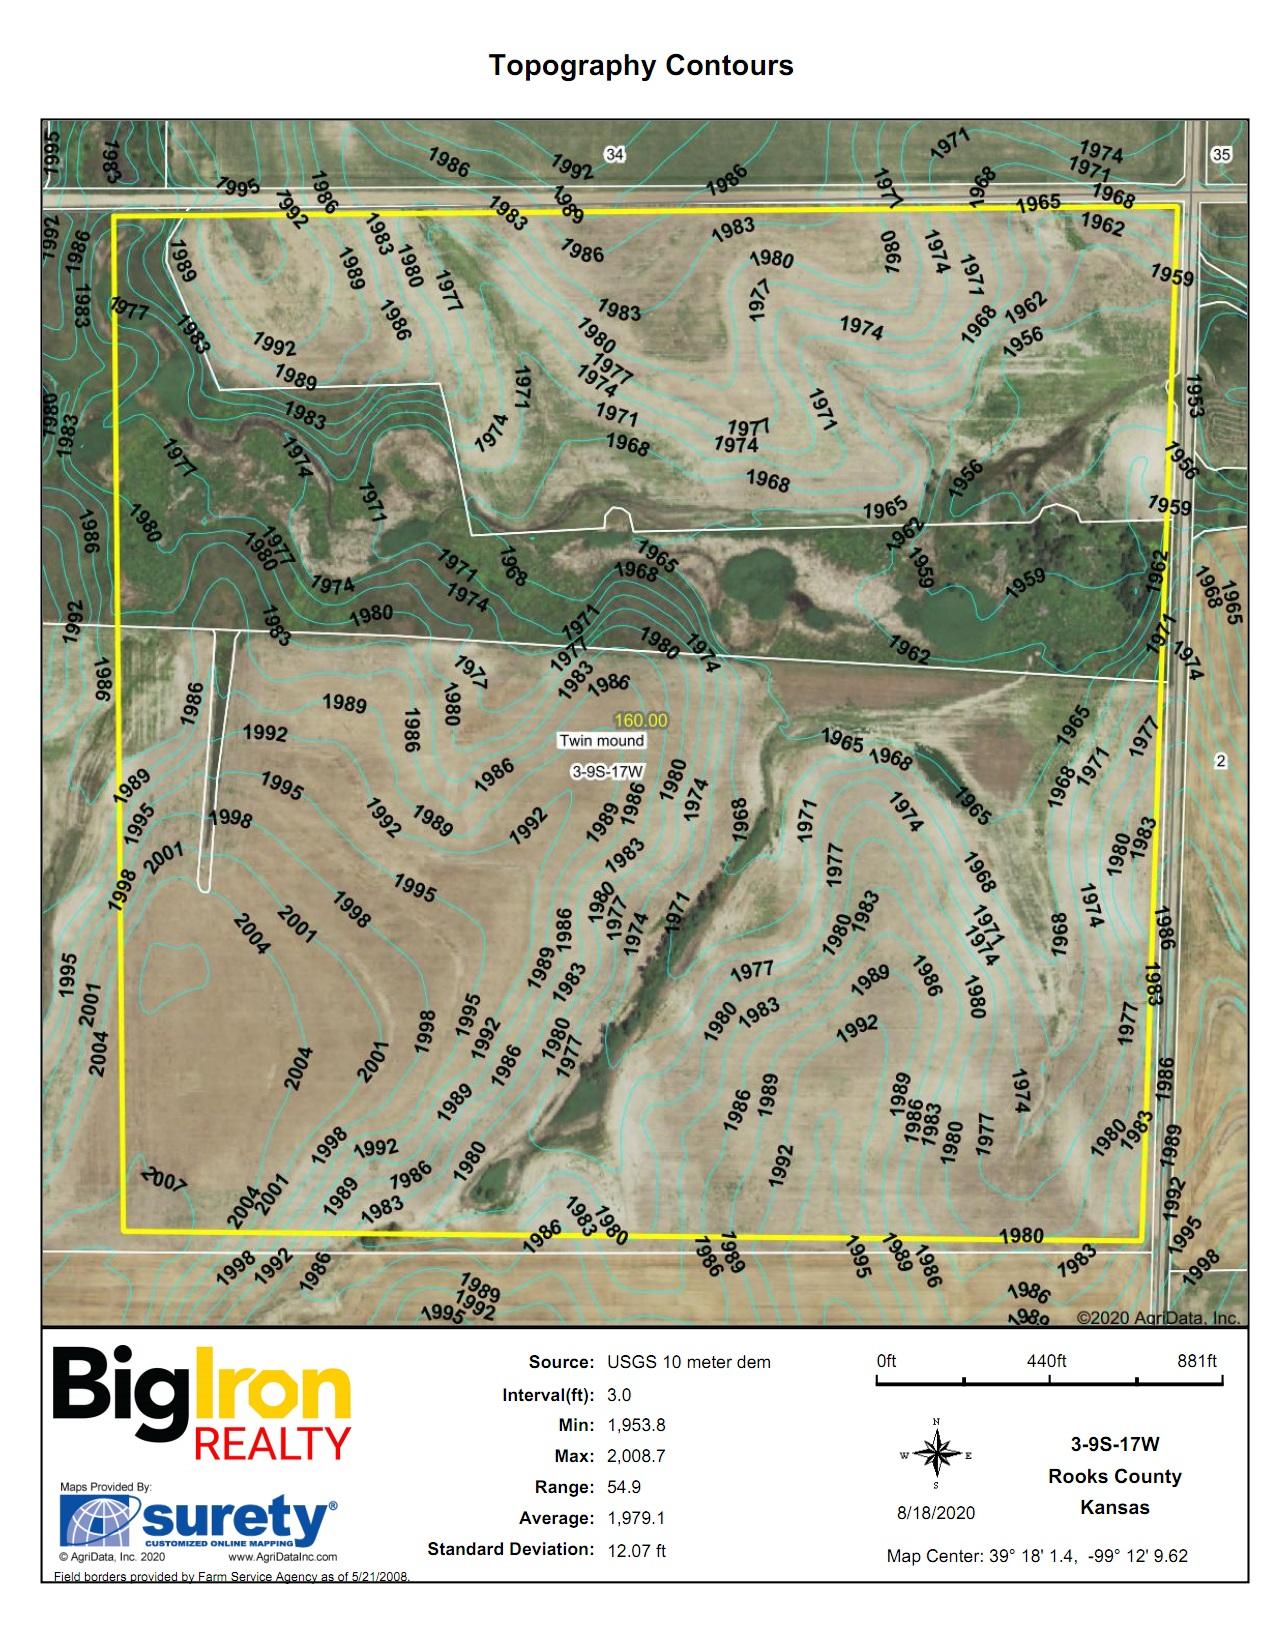 Topography Contours BIR1050